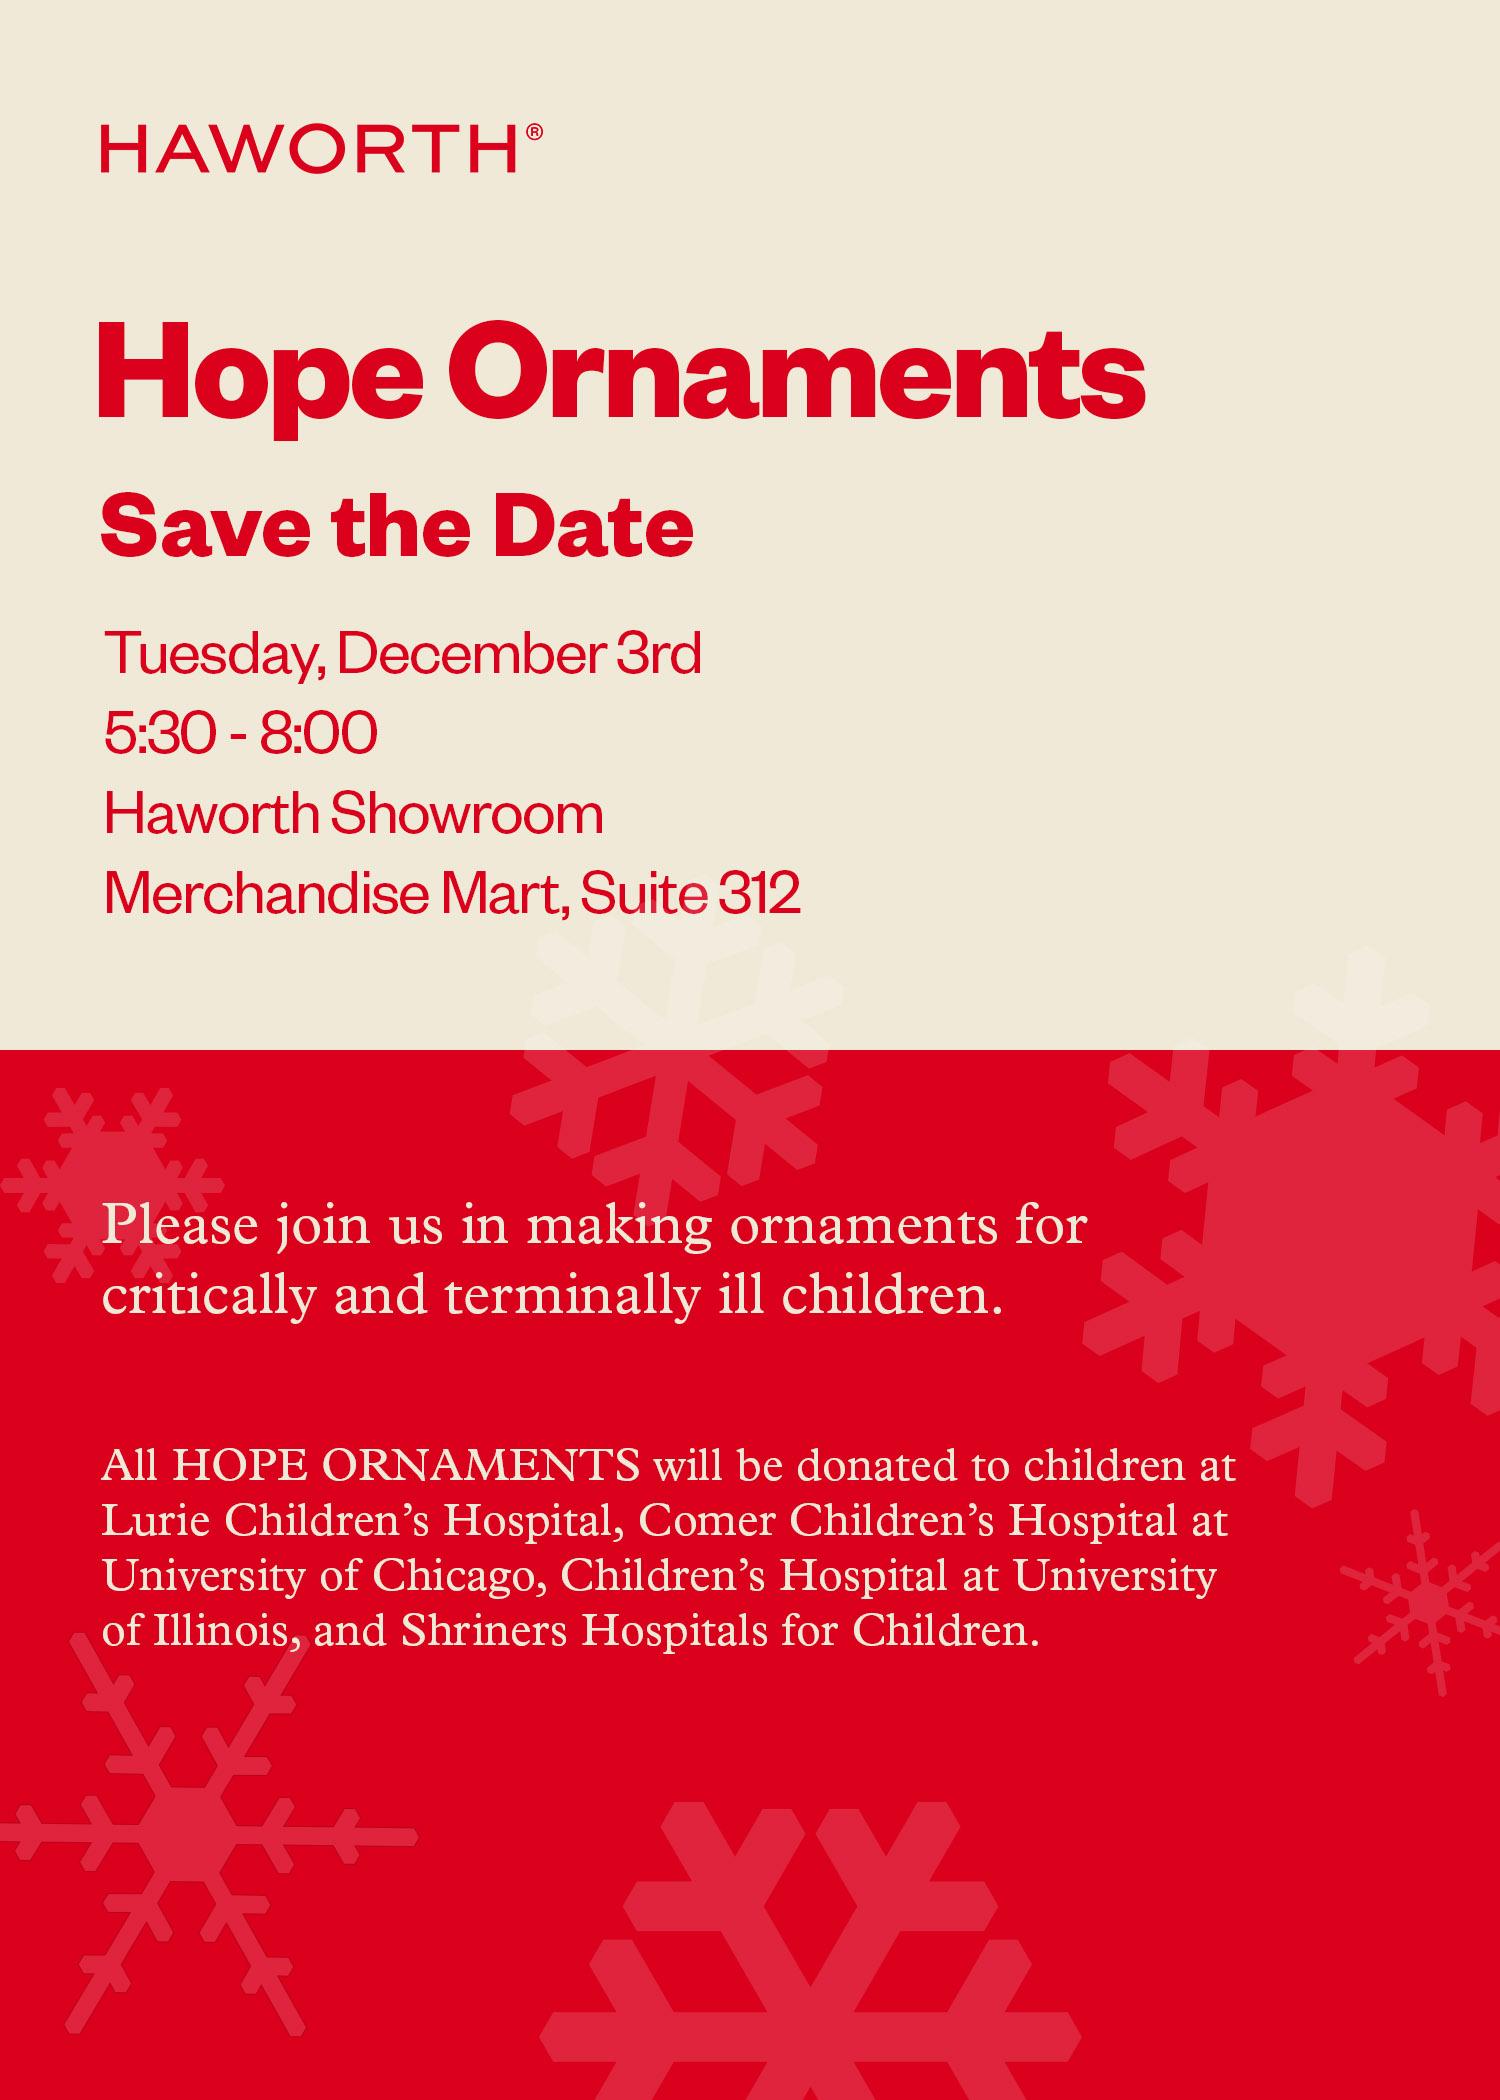 haworth ornaments event